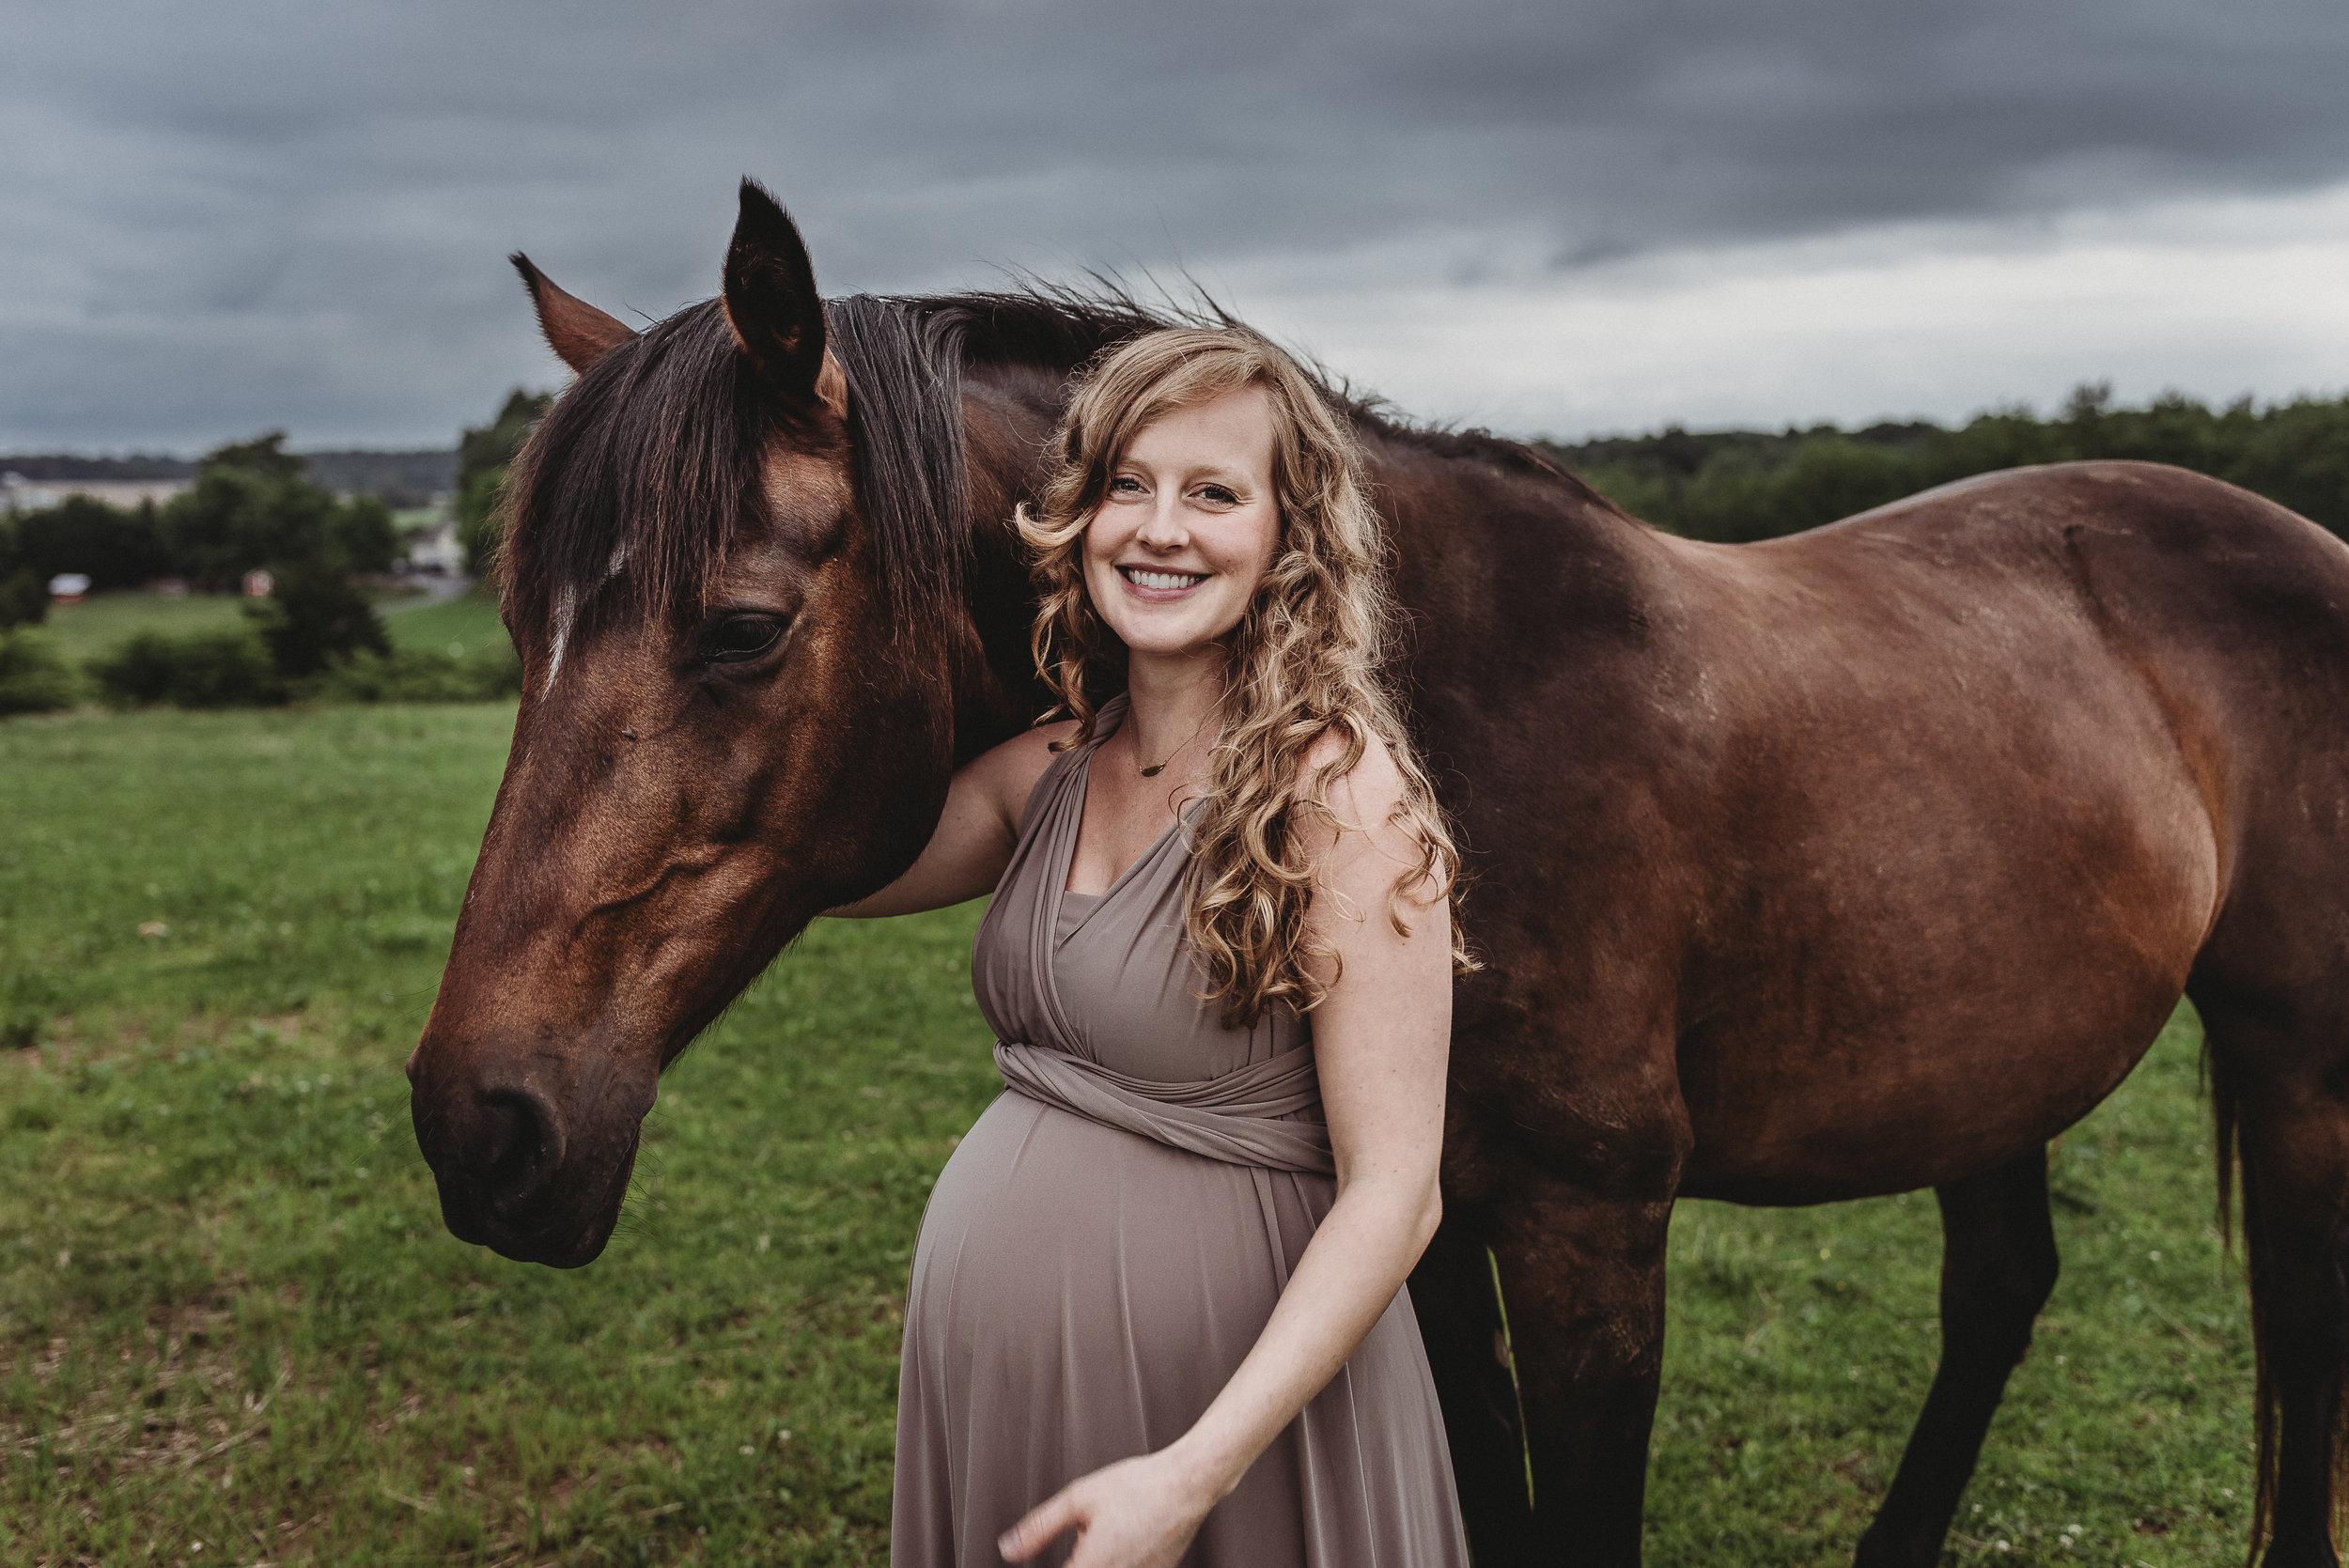 SarahSouthworth.Maternity.June2018-2.jpg